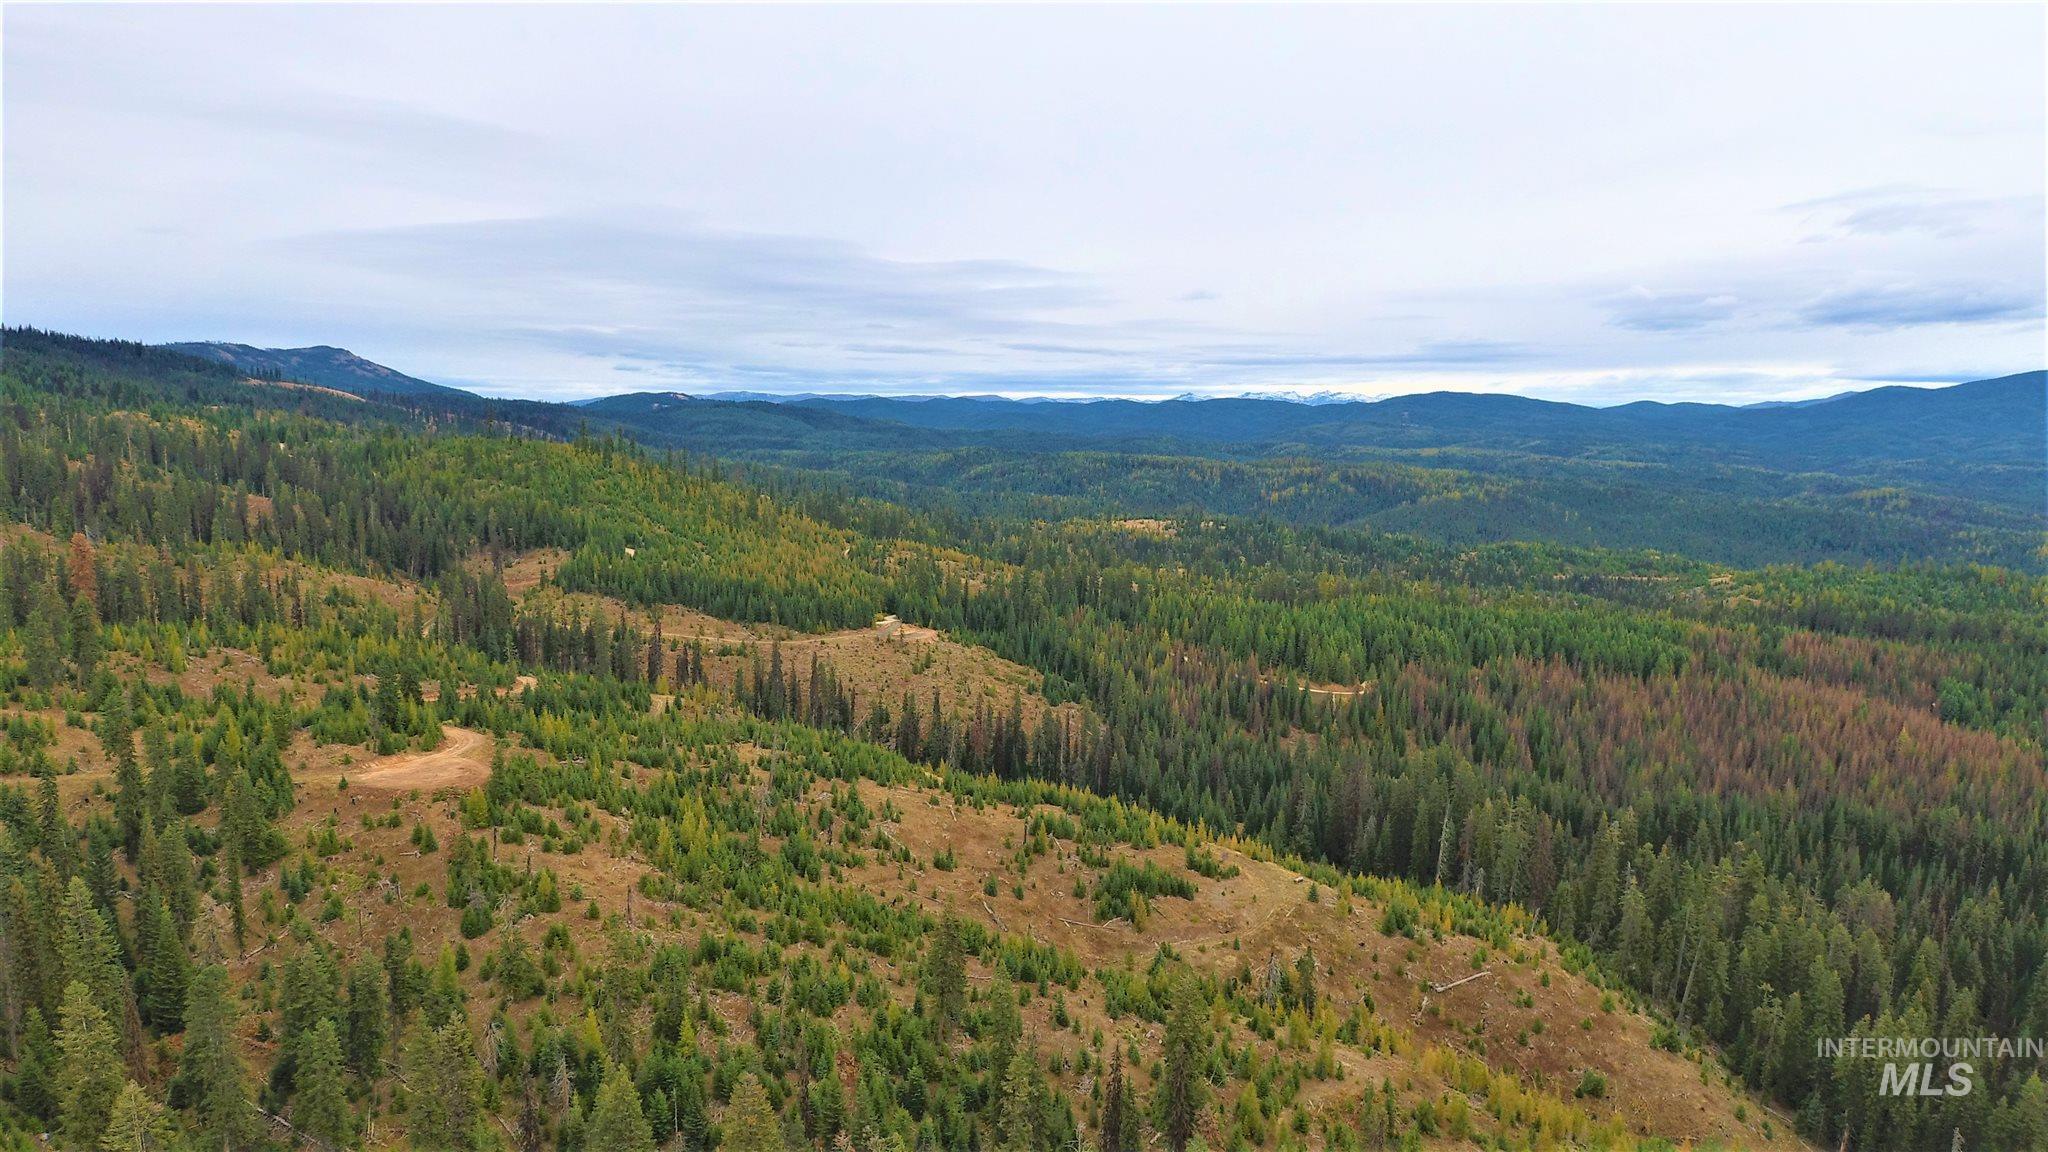 Tbd Elk Summit Properties Parcel 4 Property Photo